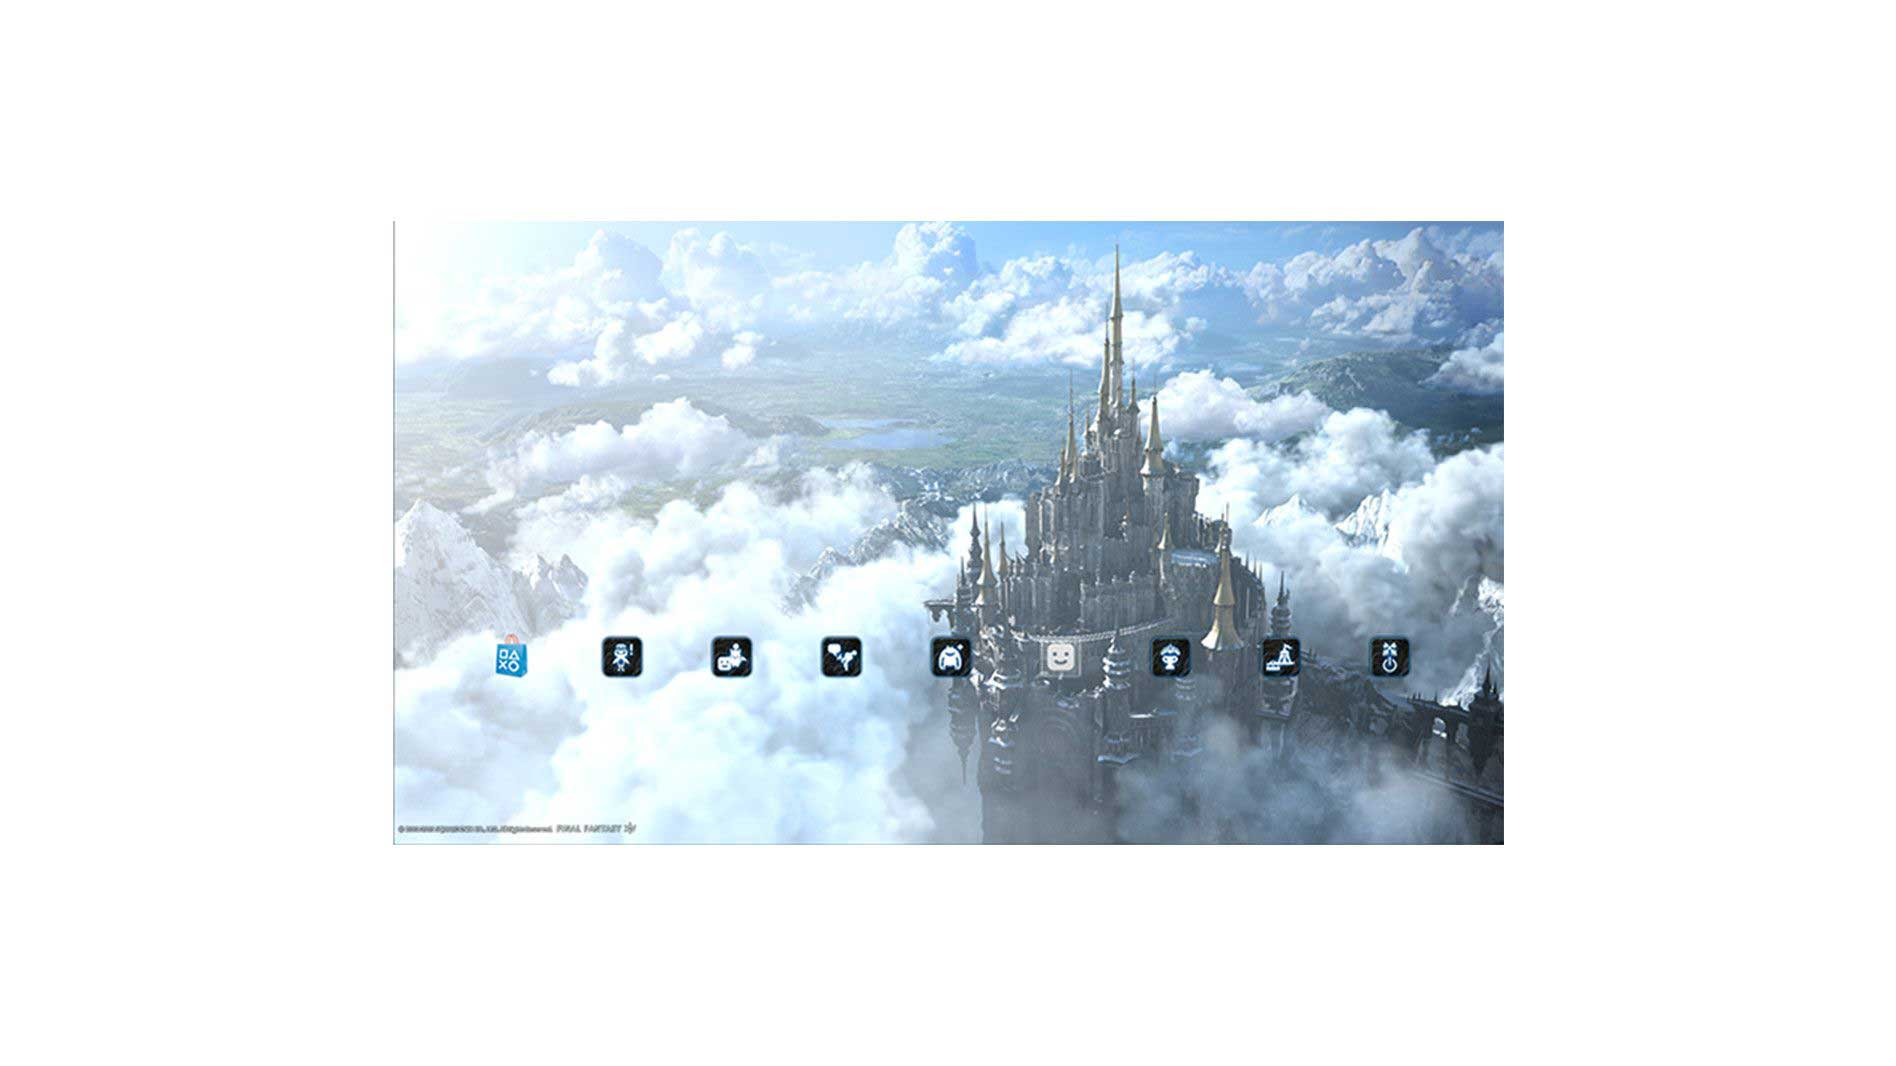 final_fantasy_14_heavensward_wallpaper_2